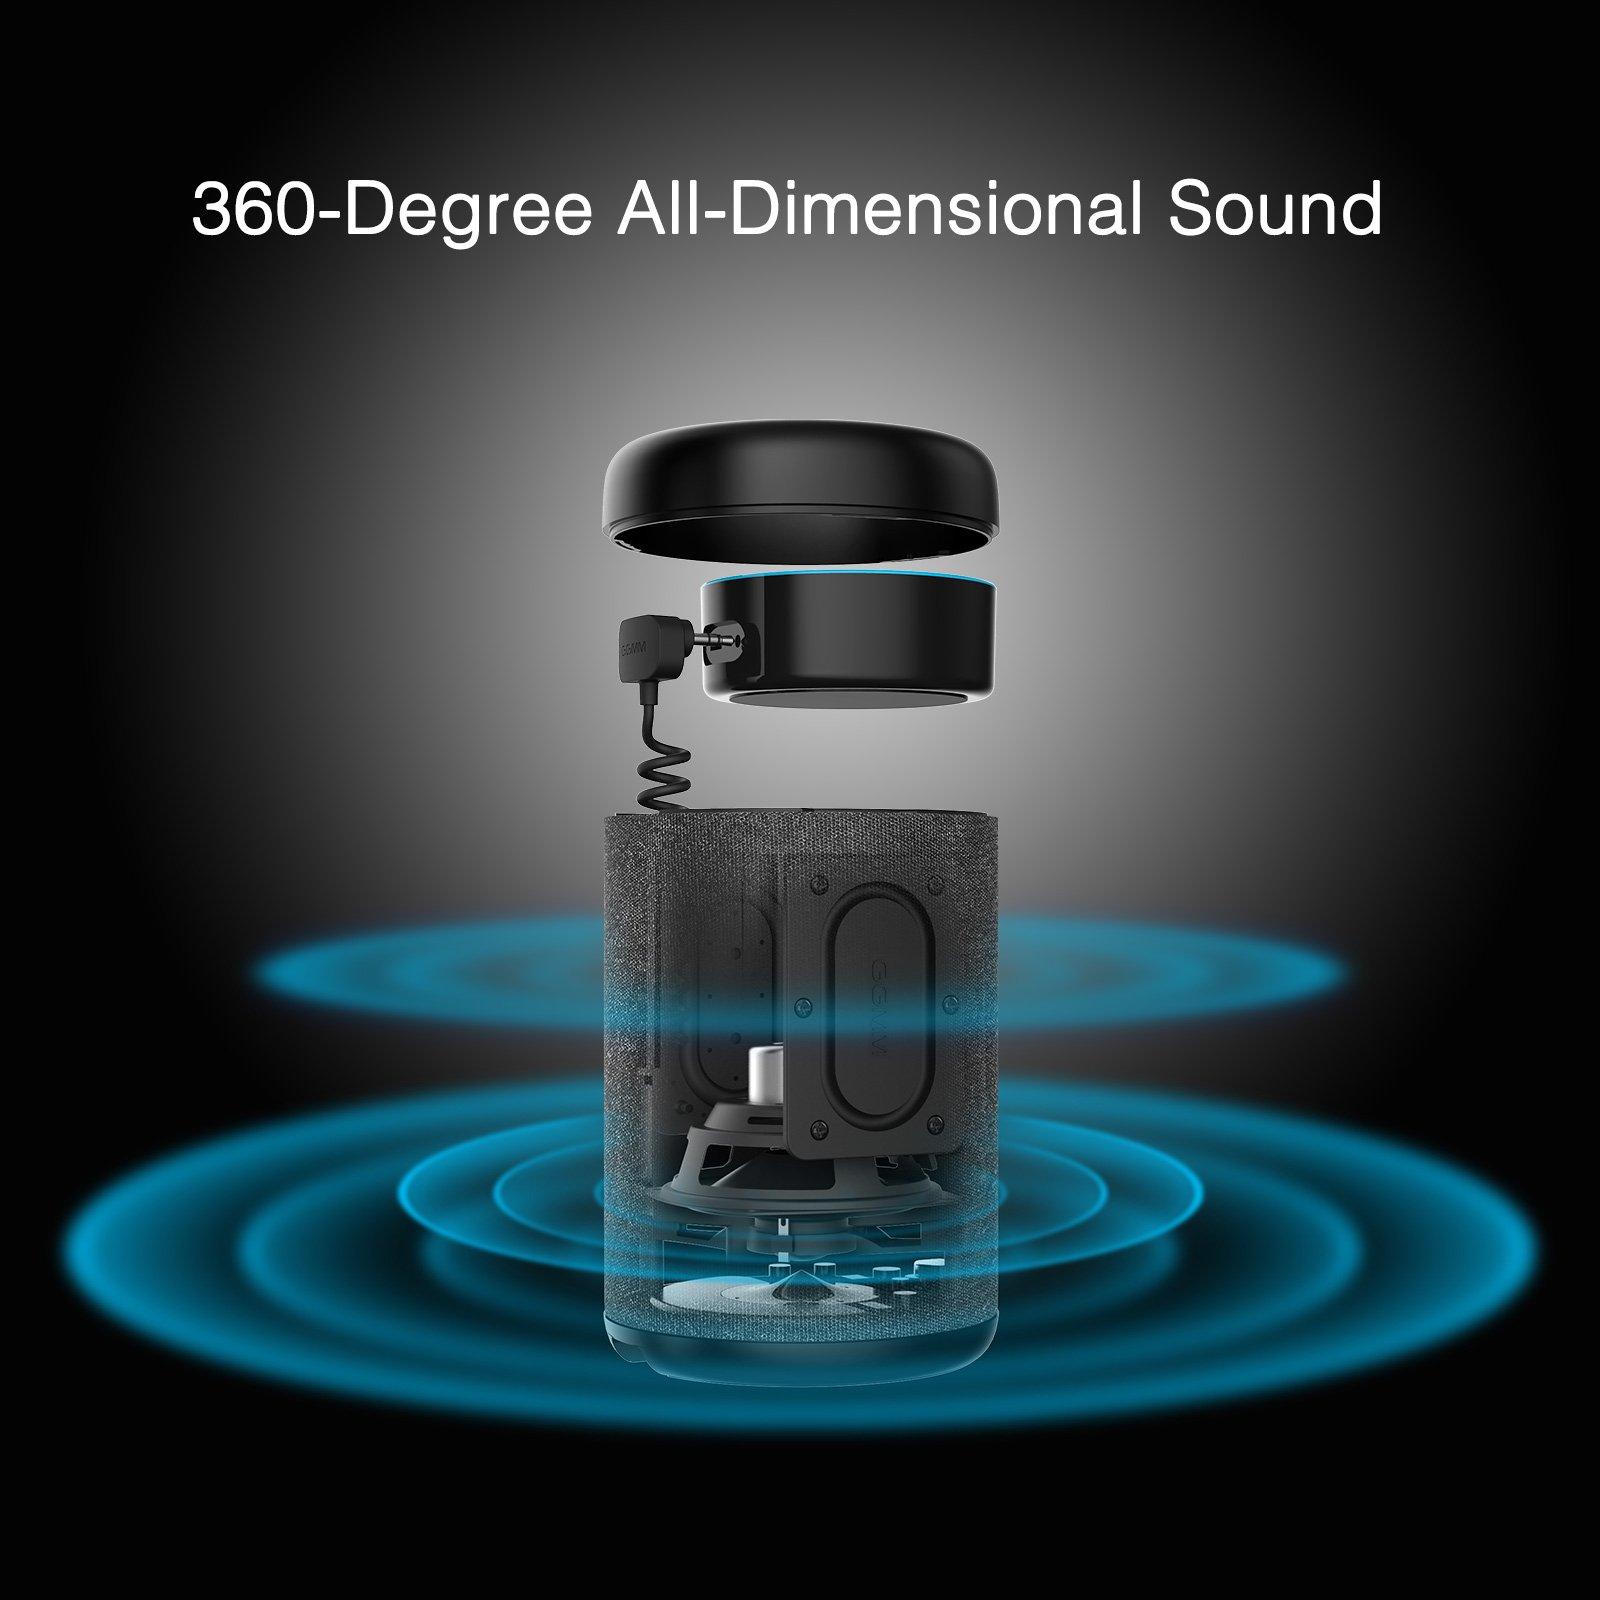 GGMM D6 Portable Speaker for Amazon Echo Dot 2nd Generation, 20W Powerful True 360 Alexa Speakers (DOT SOLD SEPARATELY) by GGMM (Image #3)